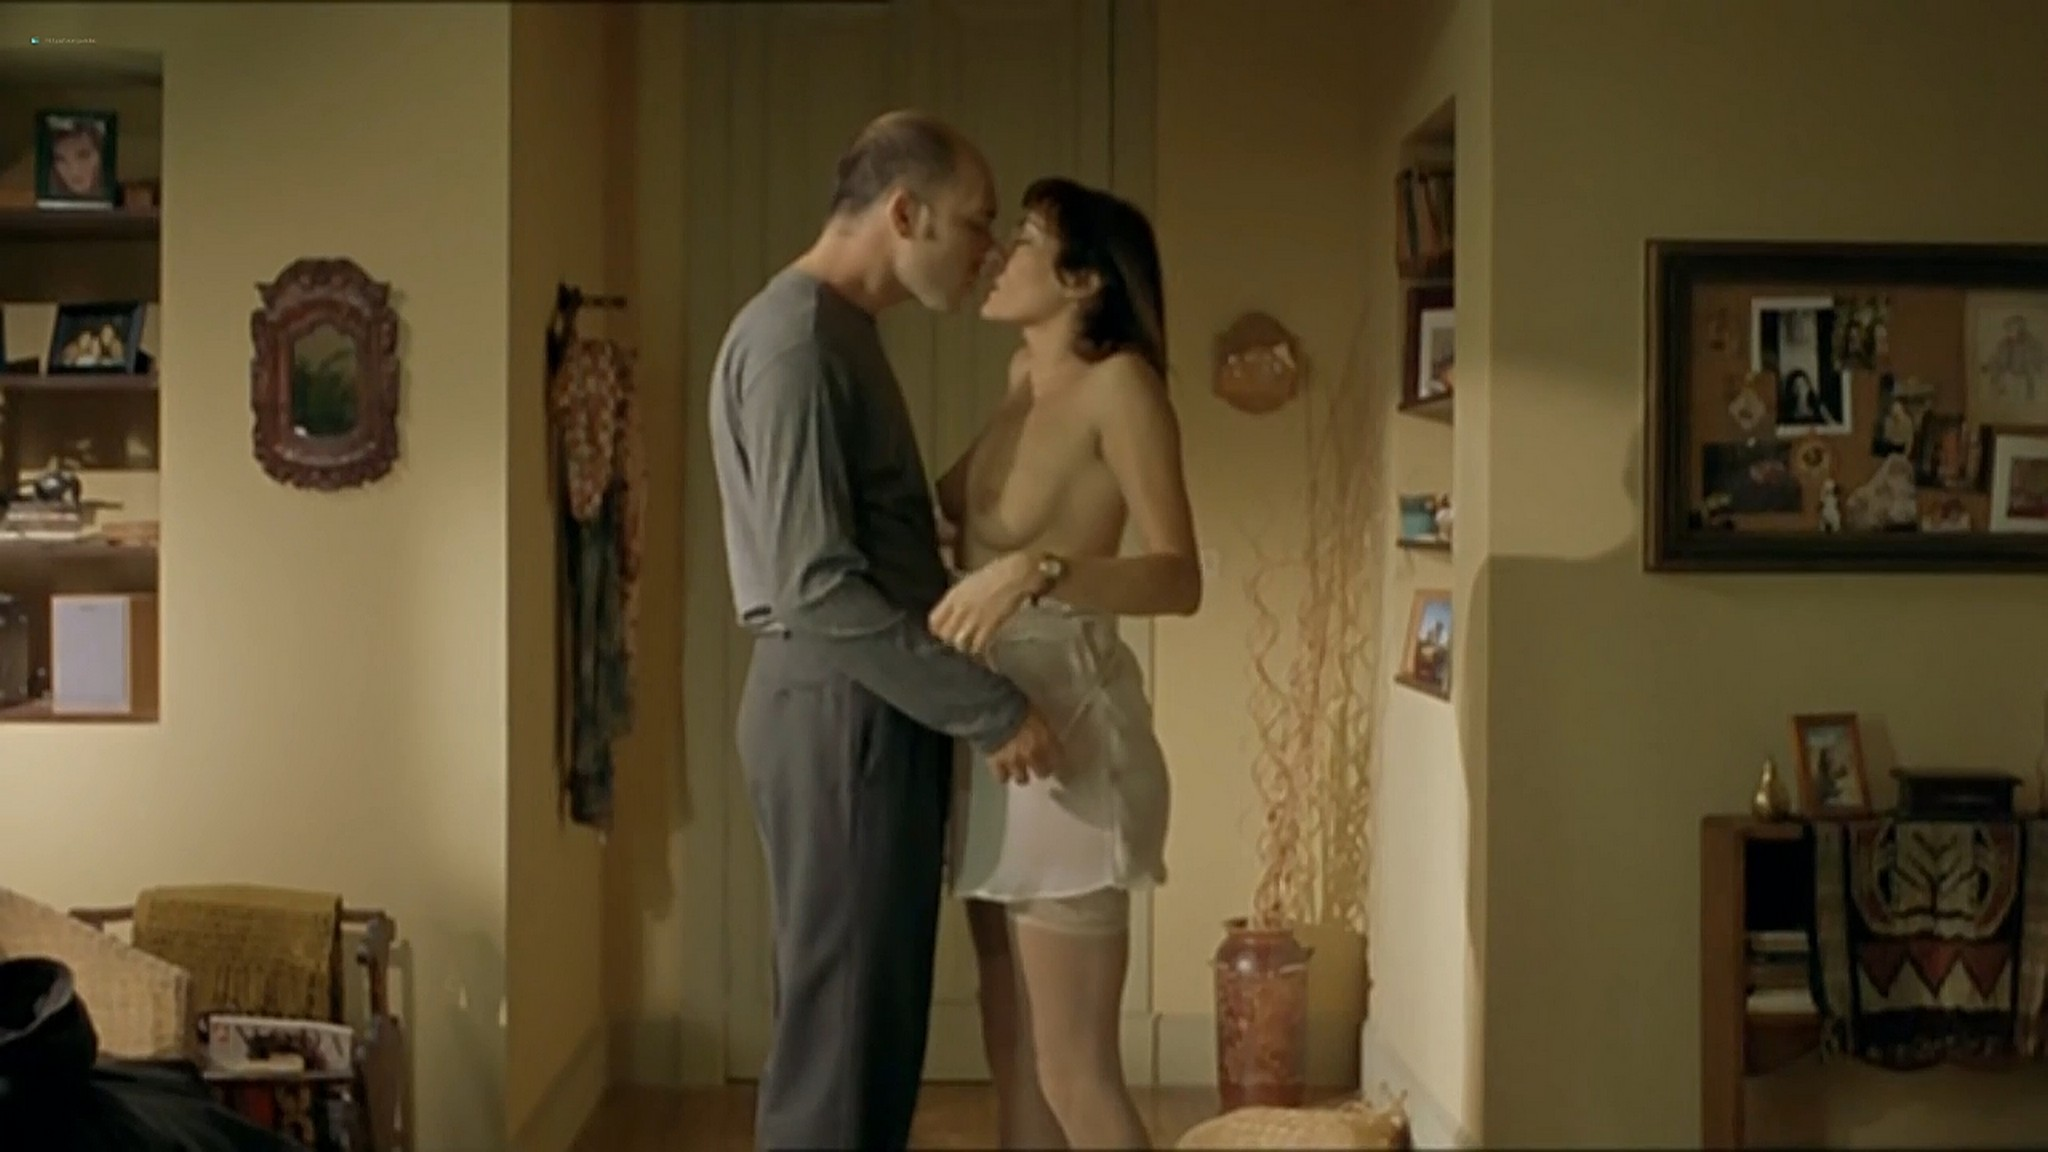 Ariadna Gil nude sex Sandra Ballesteros and other nude and sex El lado oscuro del corazon 2 AR 2001 720p 9